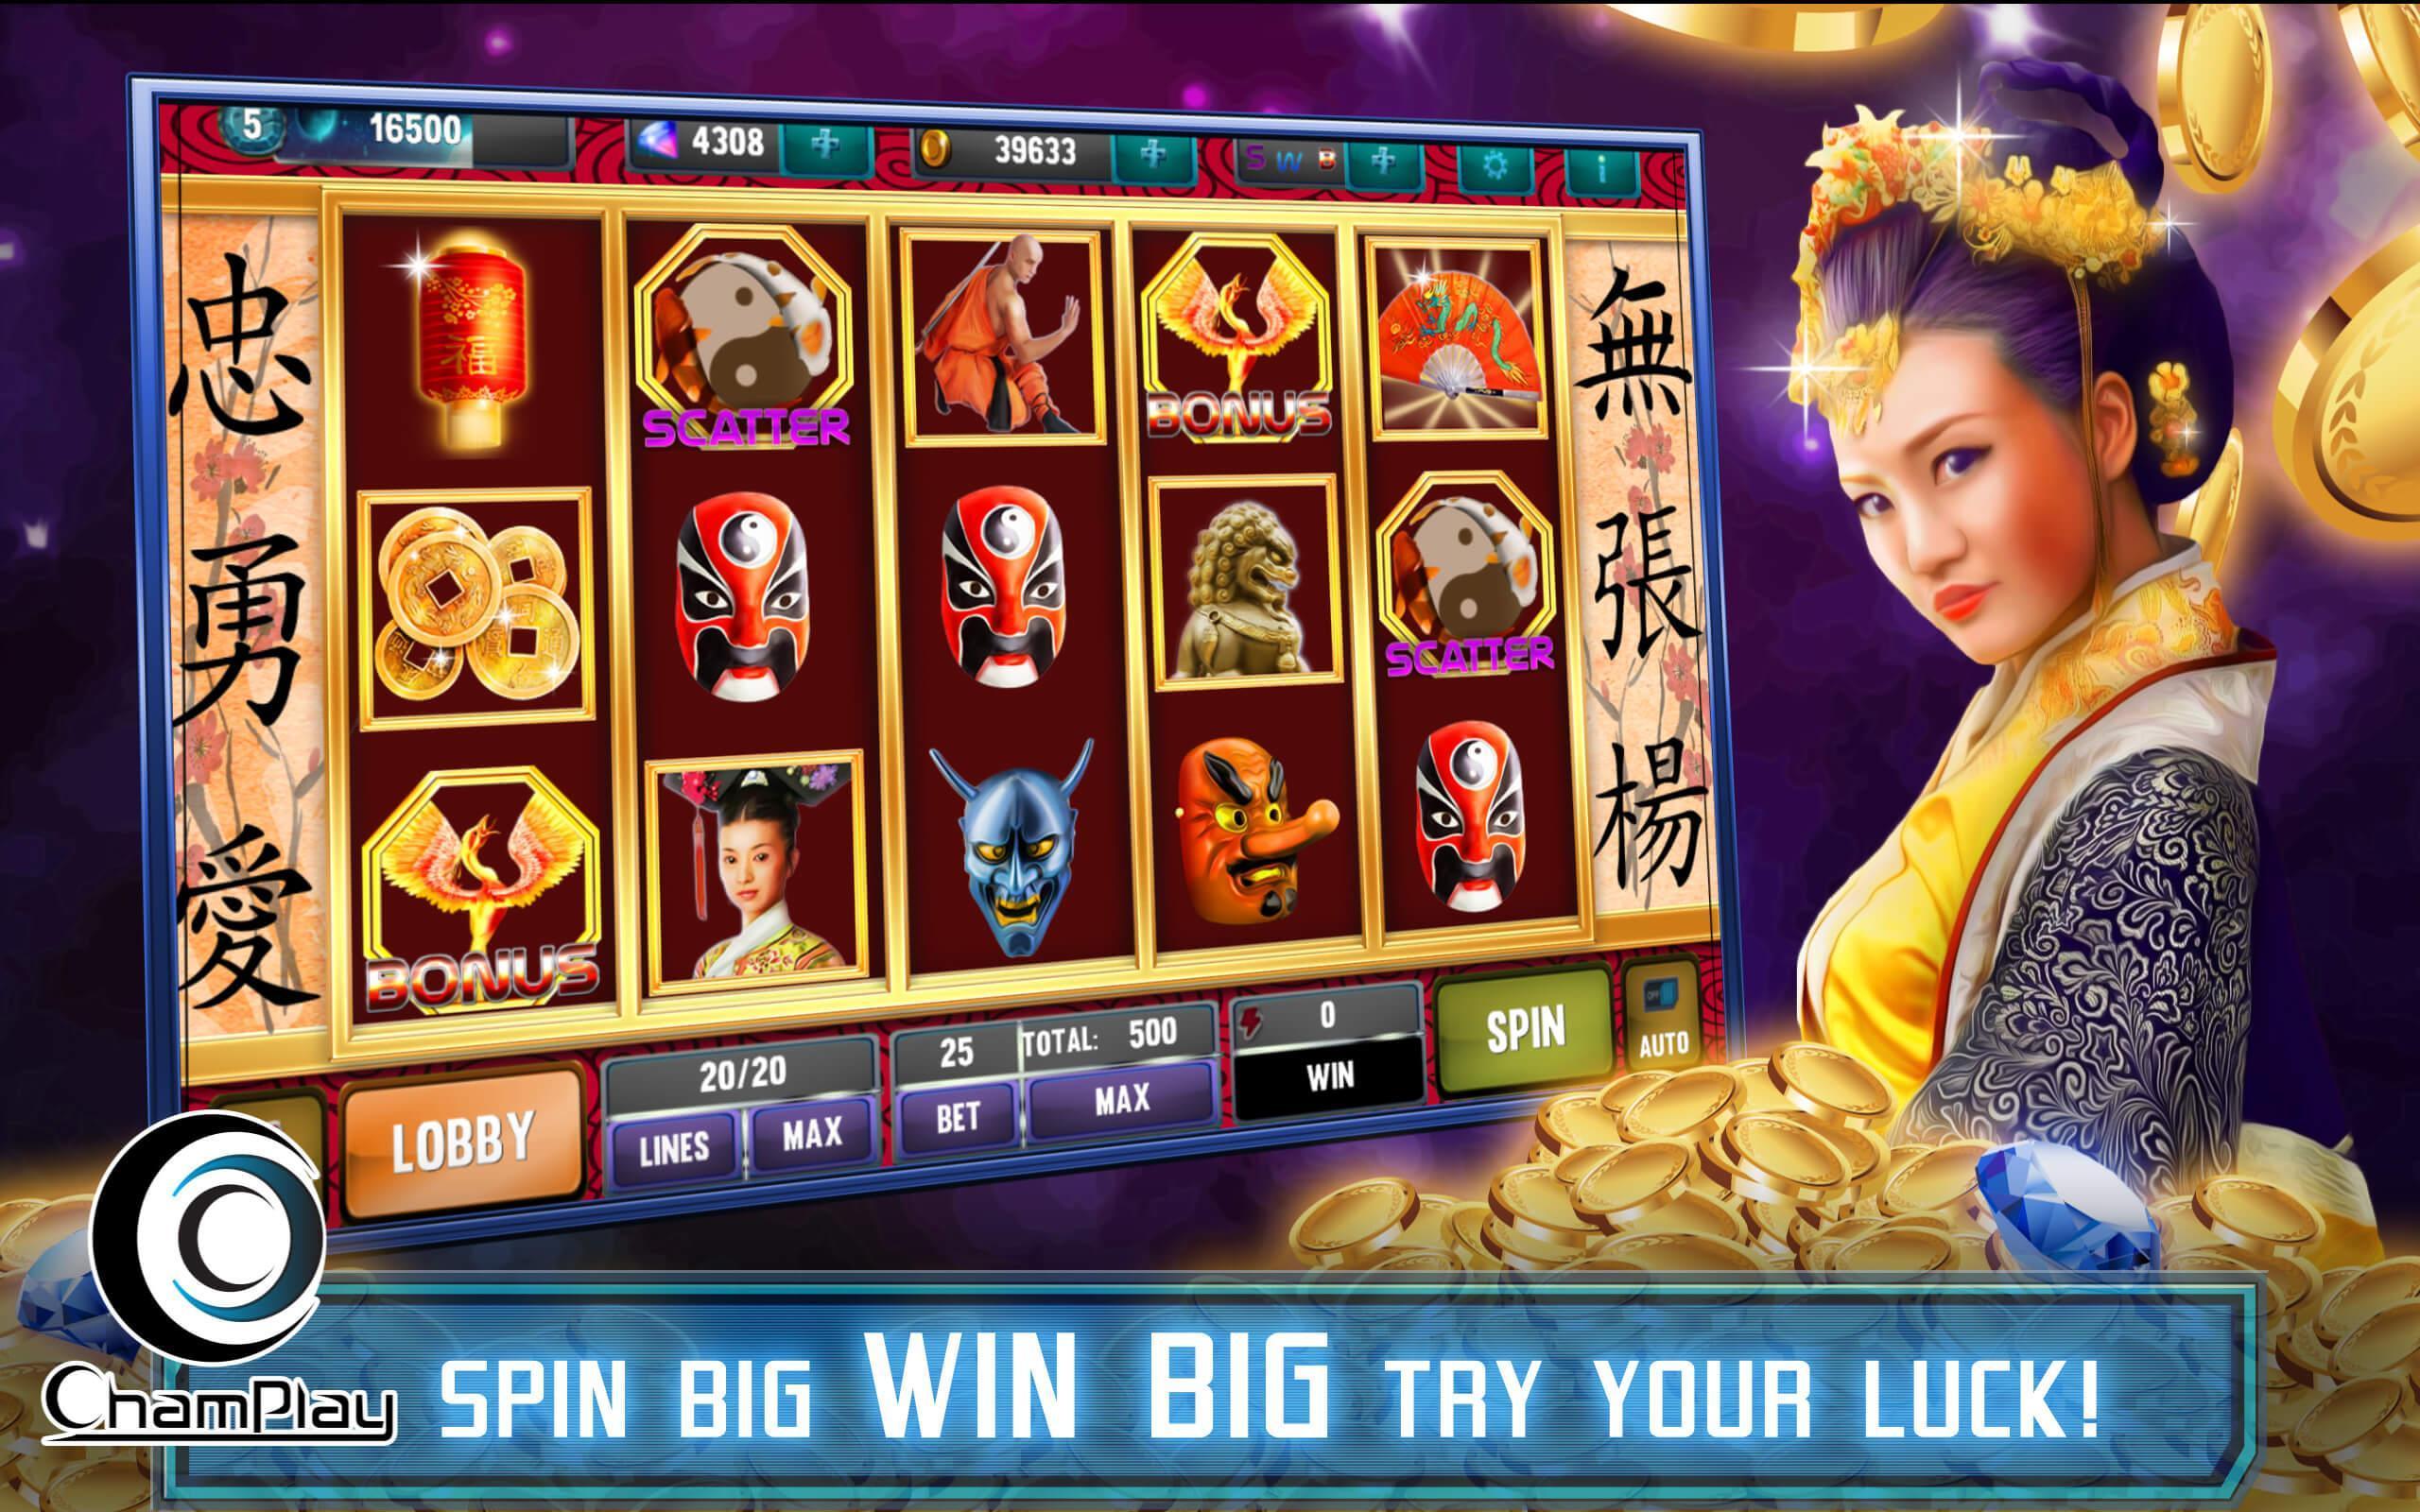 Playamo casino login australia